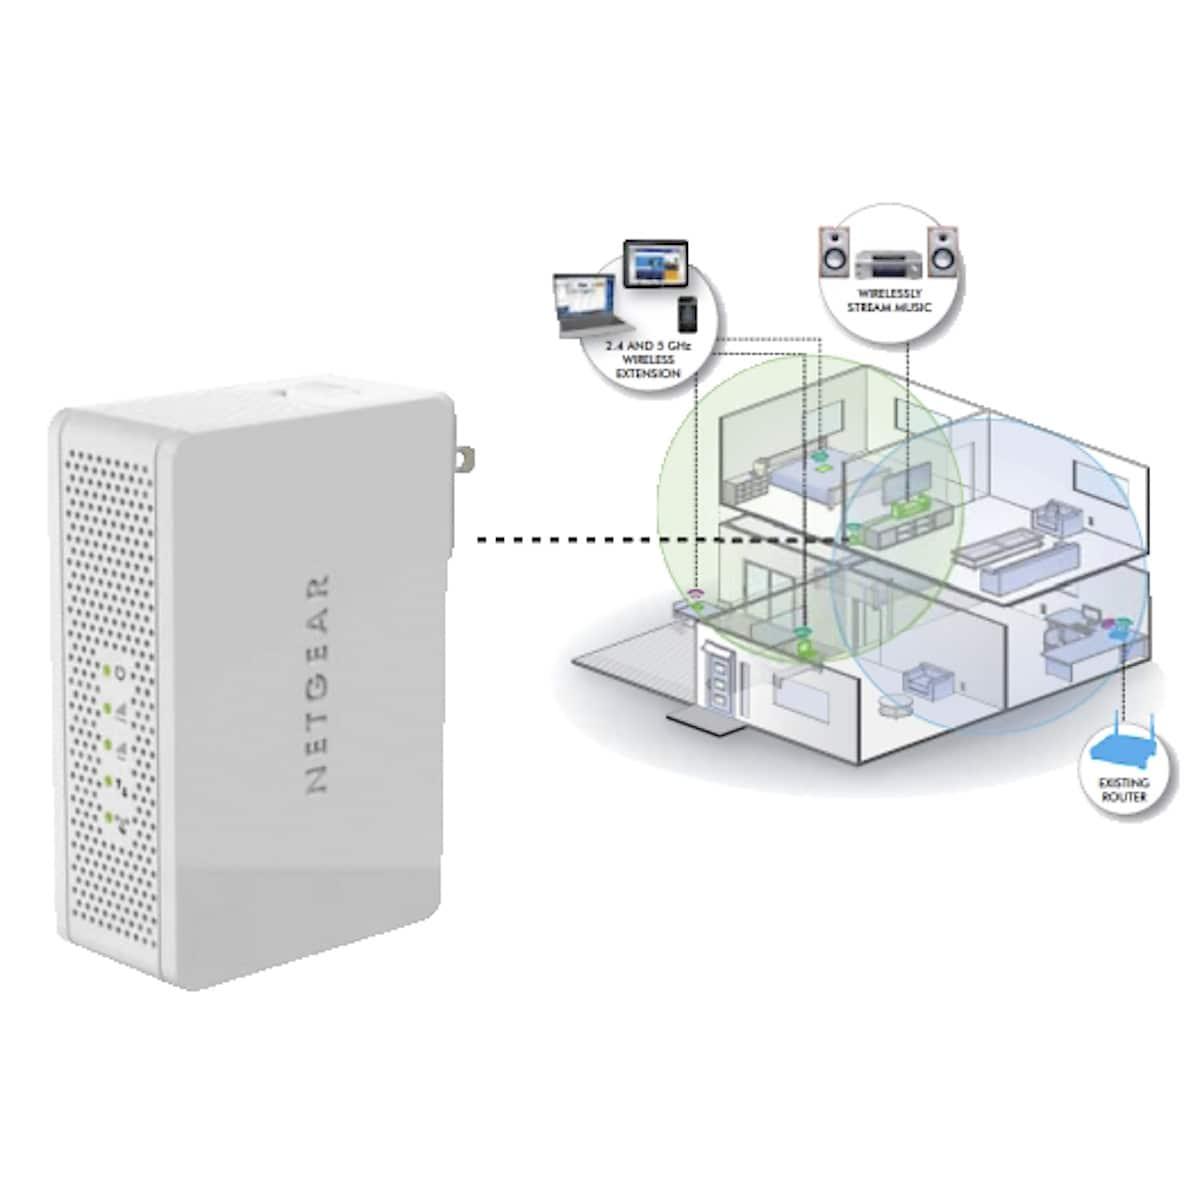 Netgear Music Streamer Wi-Fi repeater